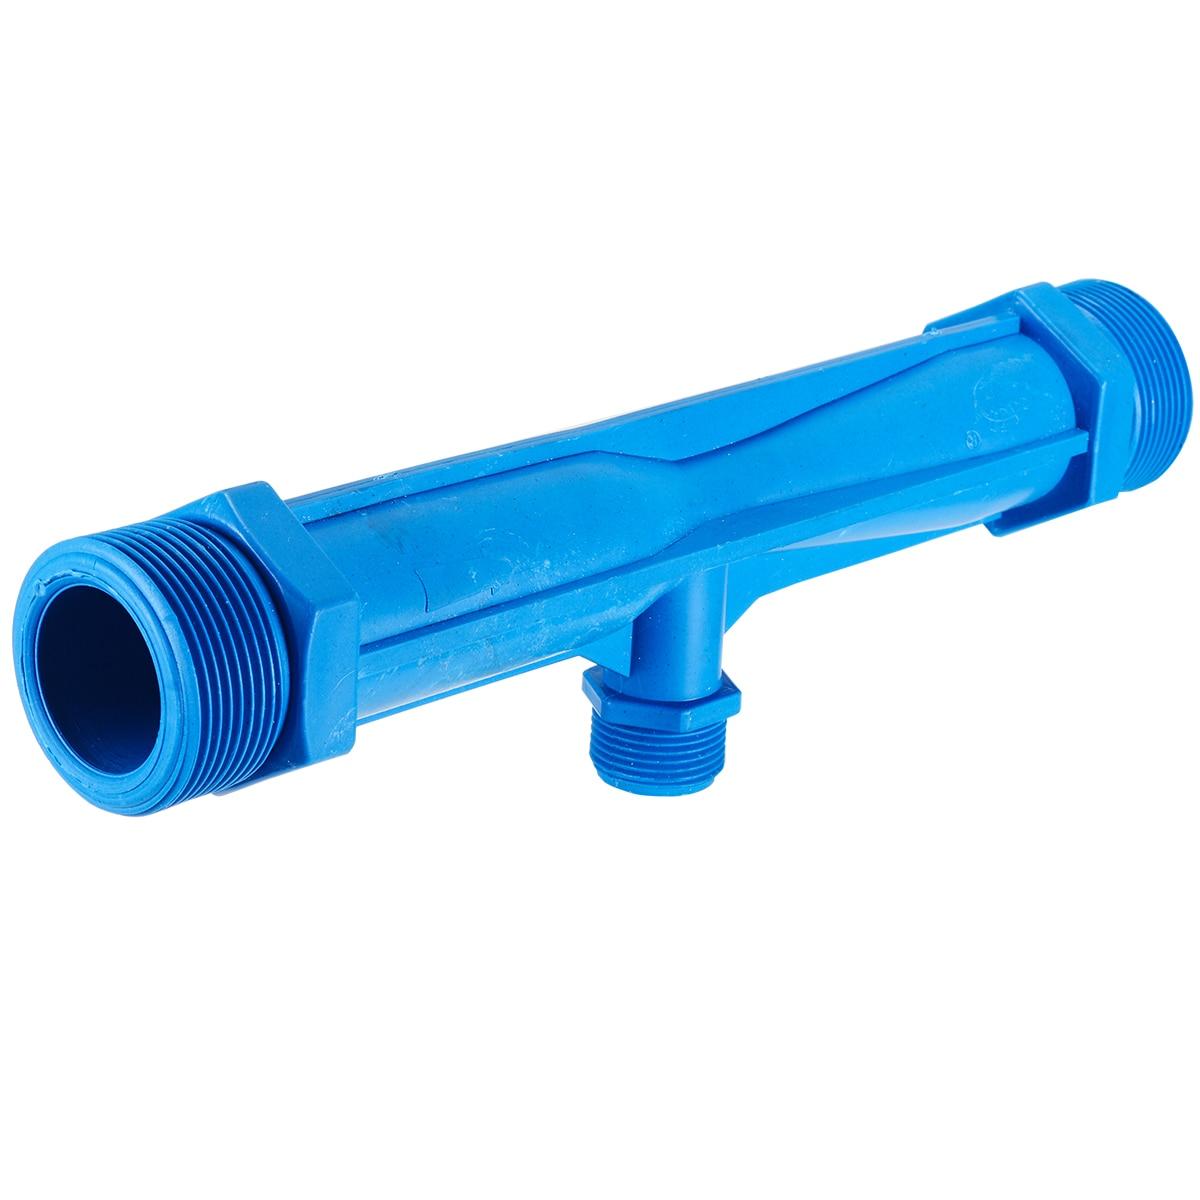 Mayitr Irrigation Venturi Fertilizer Injector Farming Water Tube Thread Irrigation Drip Device Garden Watering Tools 2 Inch